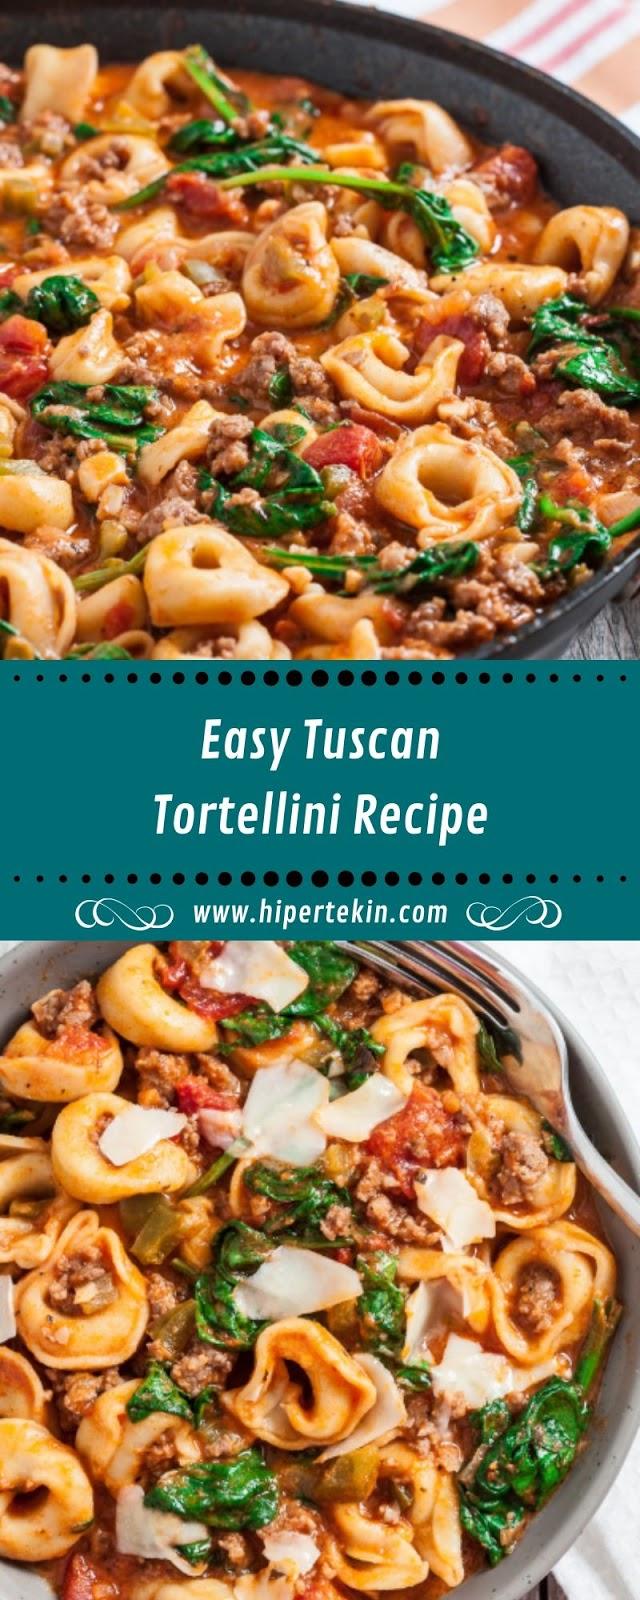 Easy Tuscan Tortellini Recipe